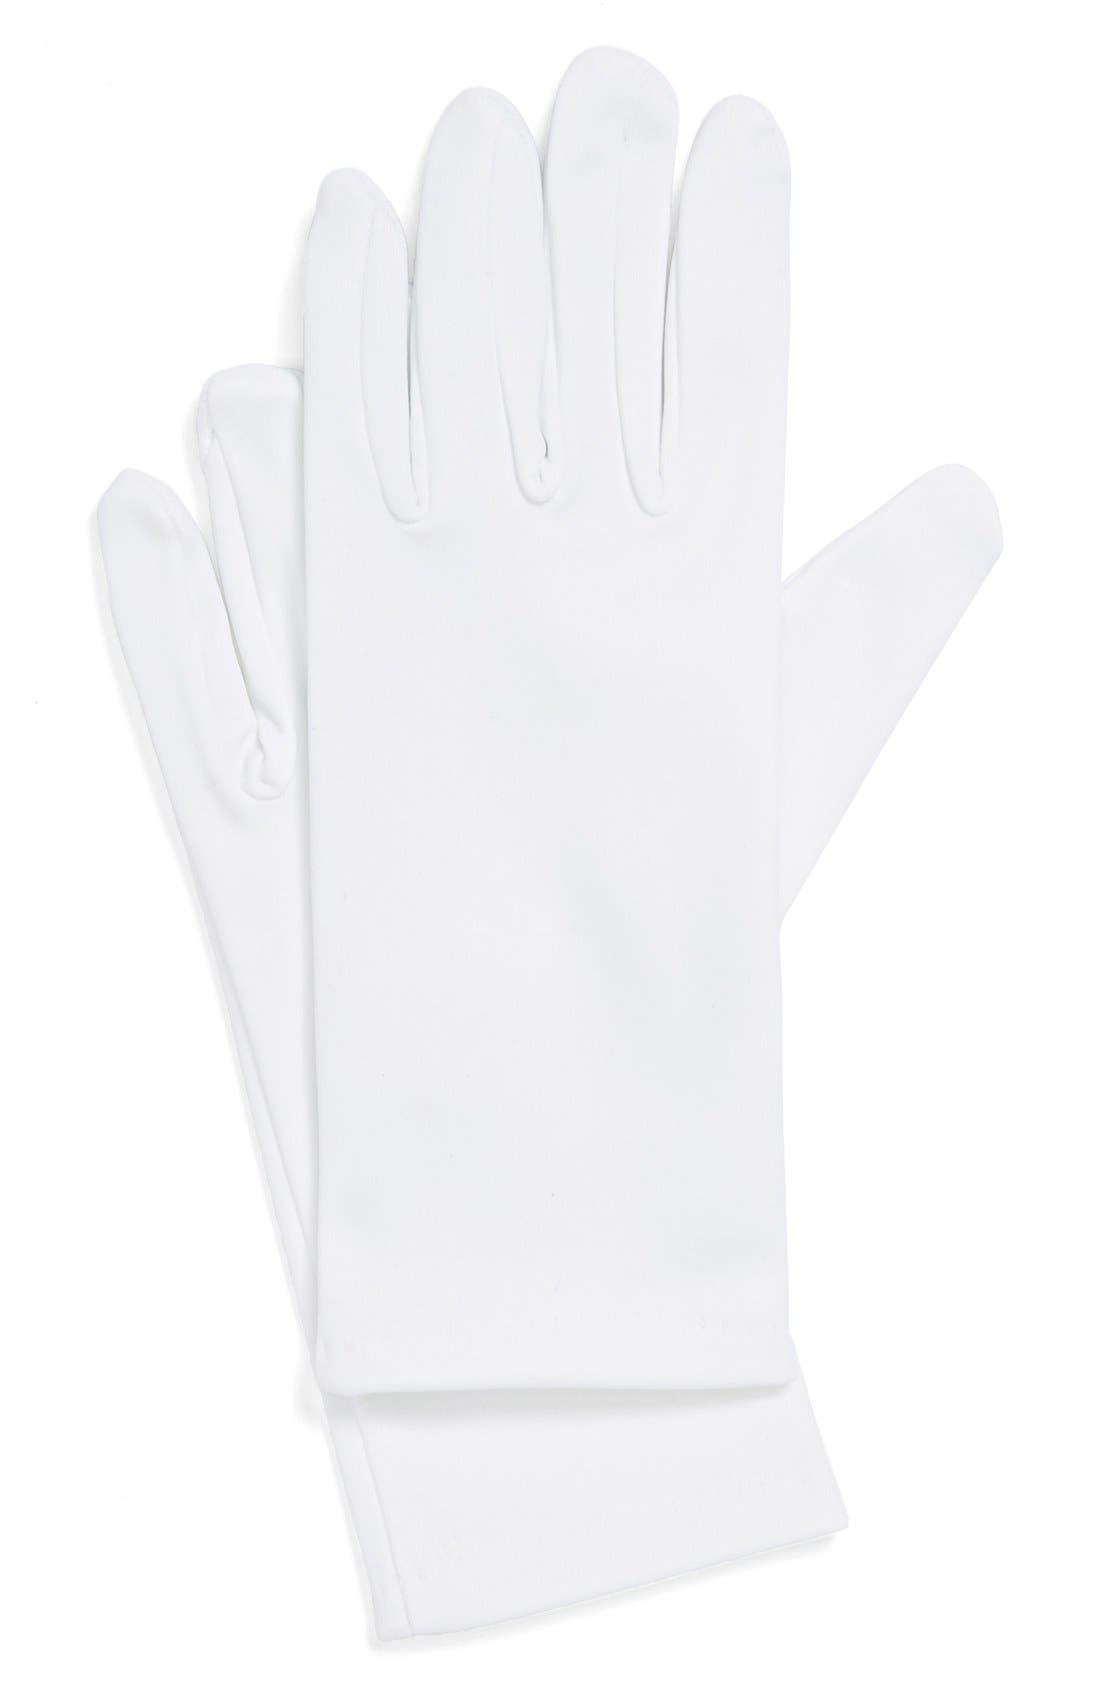 Alternate Image 1 Selected - Andrea's Beau Satin Gloves (Girls)